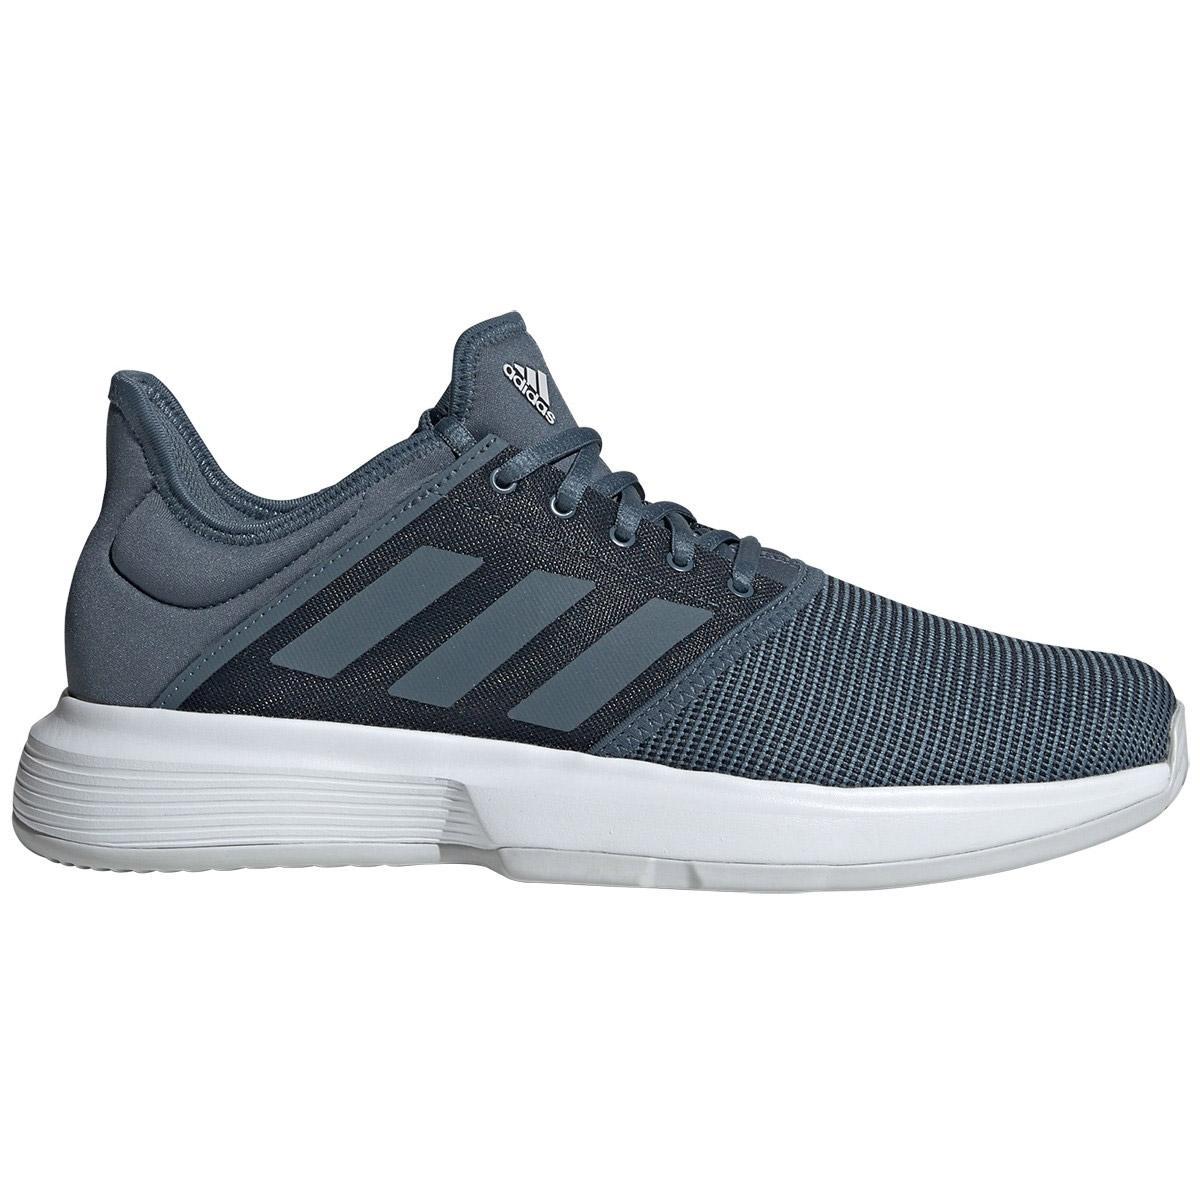 Adidas Mens GameCourt Tennis Shoes